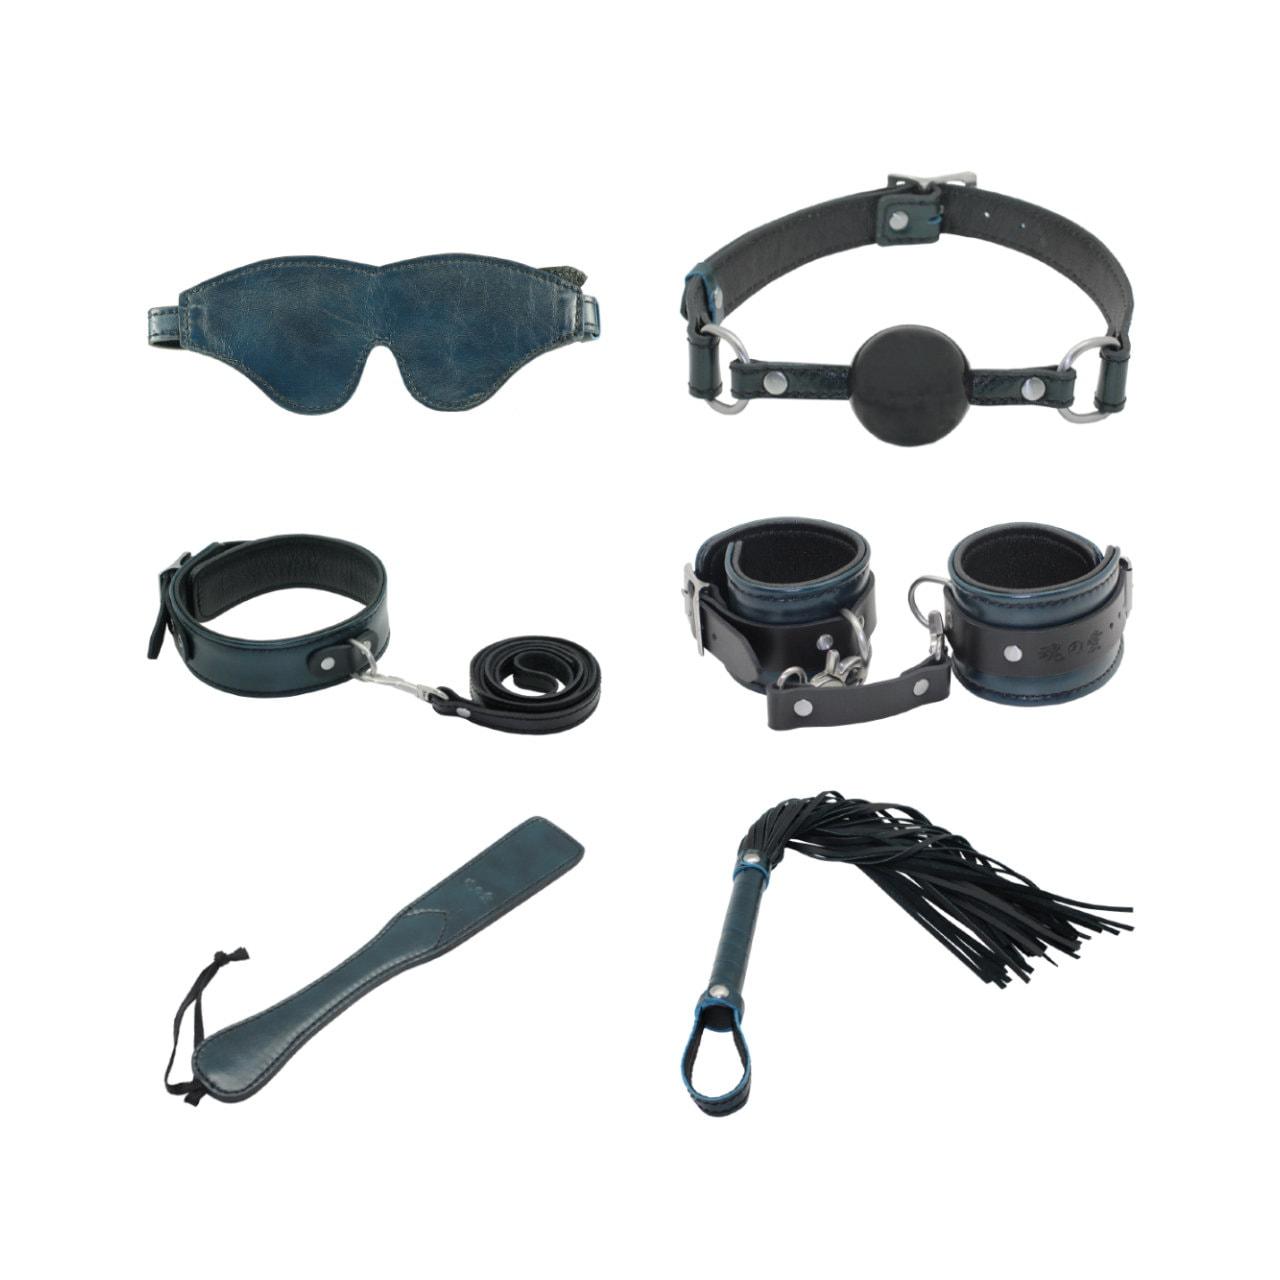 de60e86b2 BDSM Set Collar w  Leash Handcuffs Silicone Ball Gag